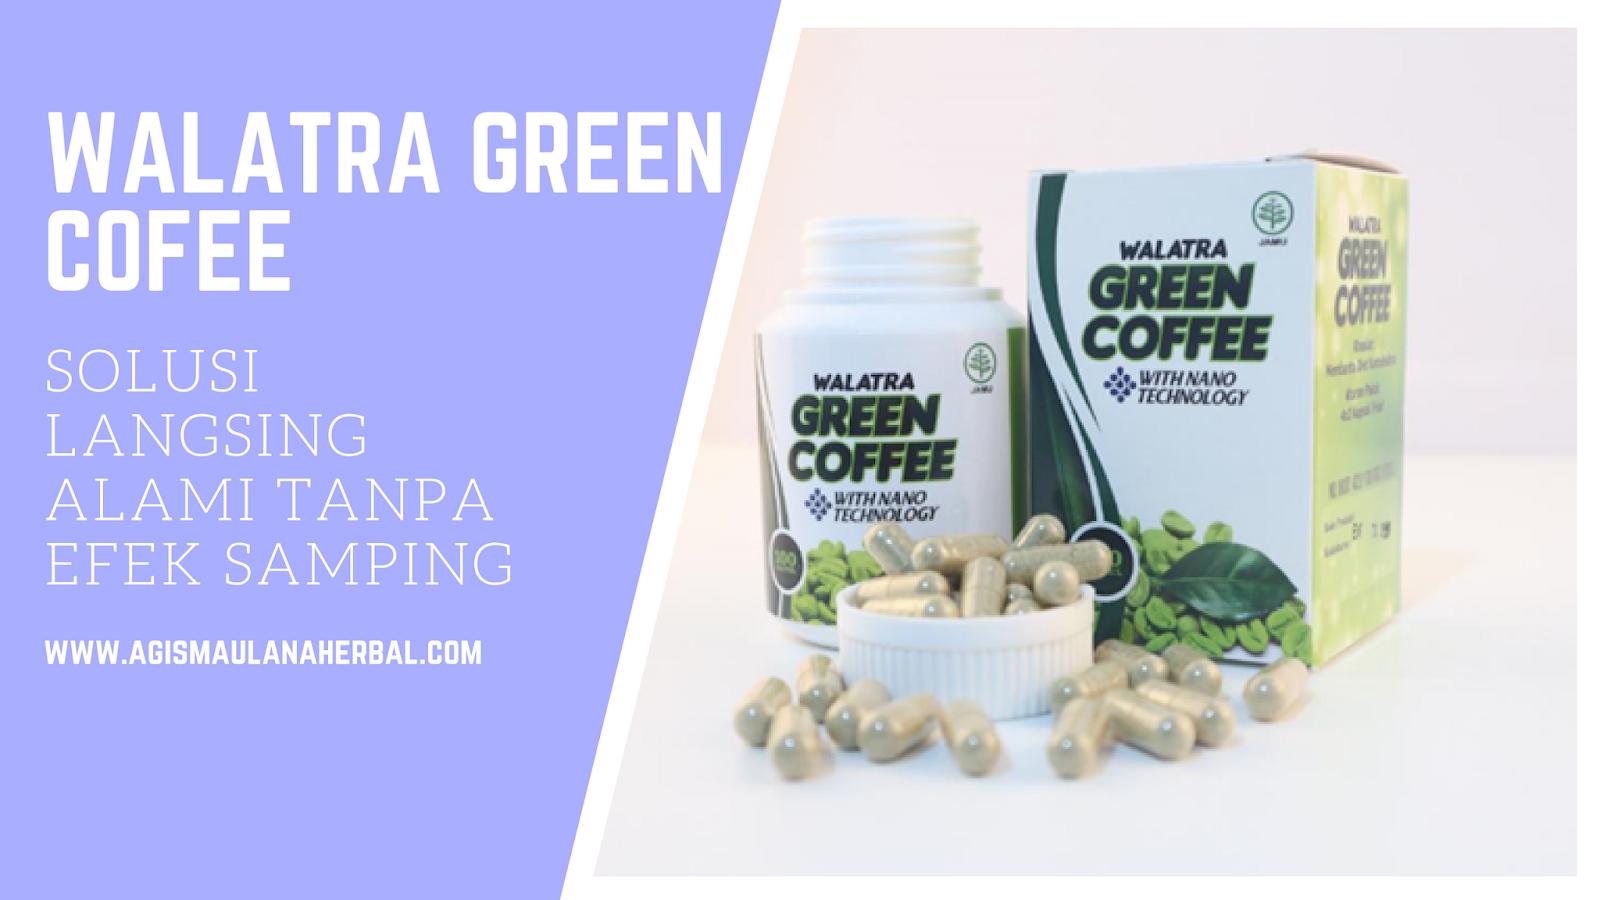 Walatra Green Cofee